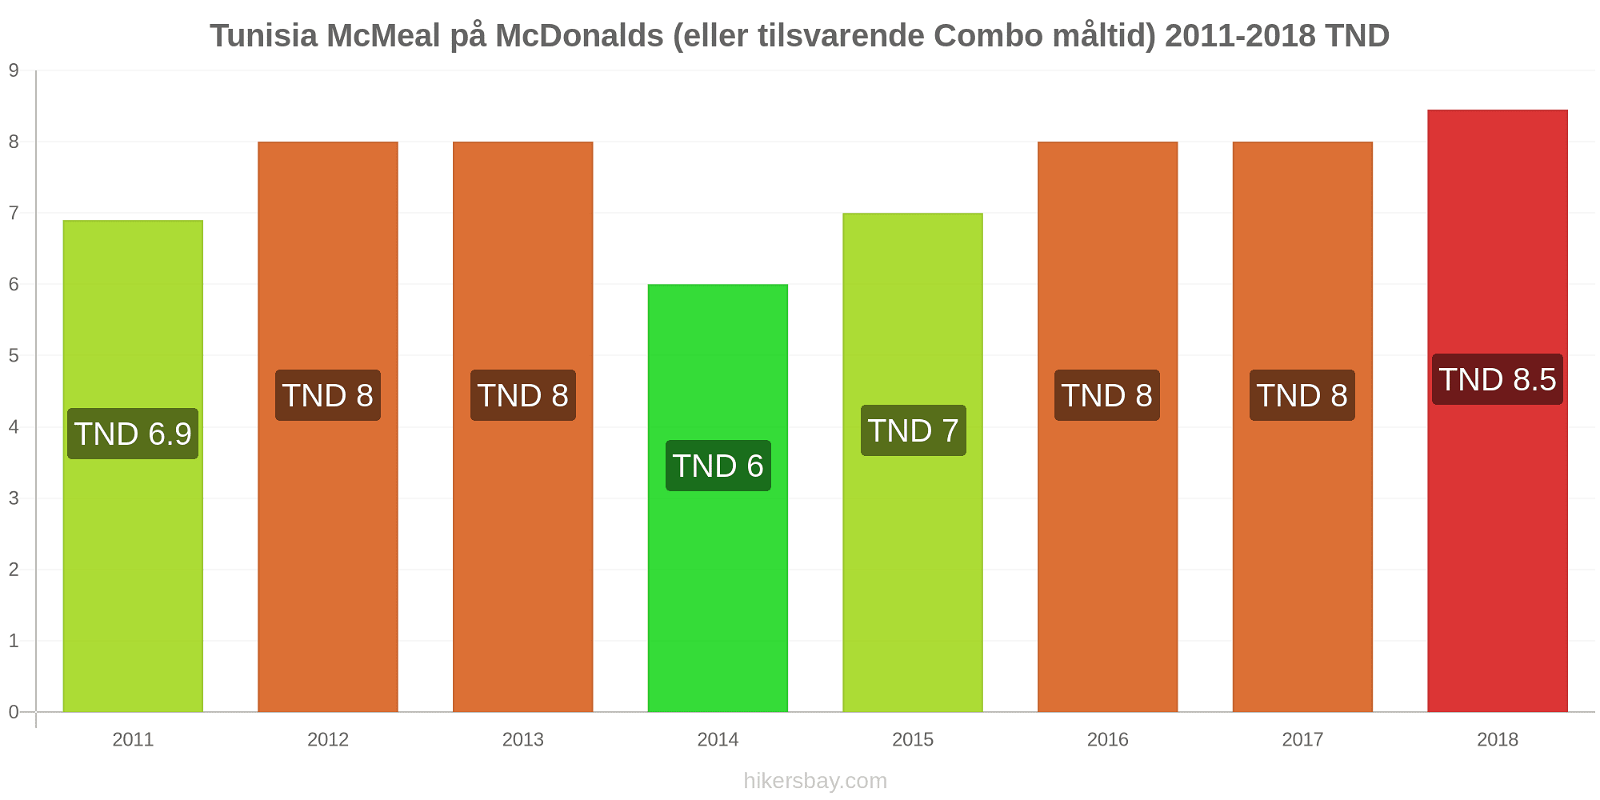 Tunisia prisendringer McMeal på McDonalds (eller tilsvarende Combo måltid) hikersbay.com